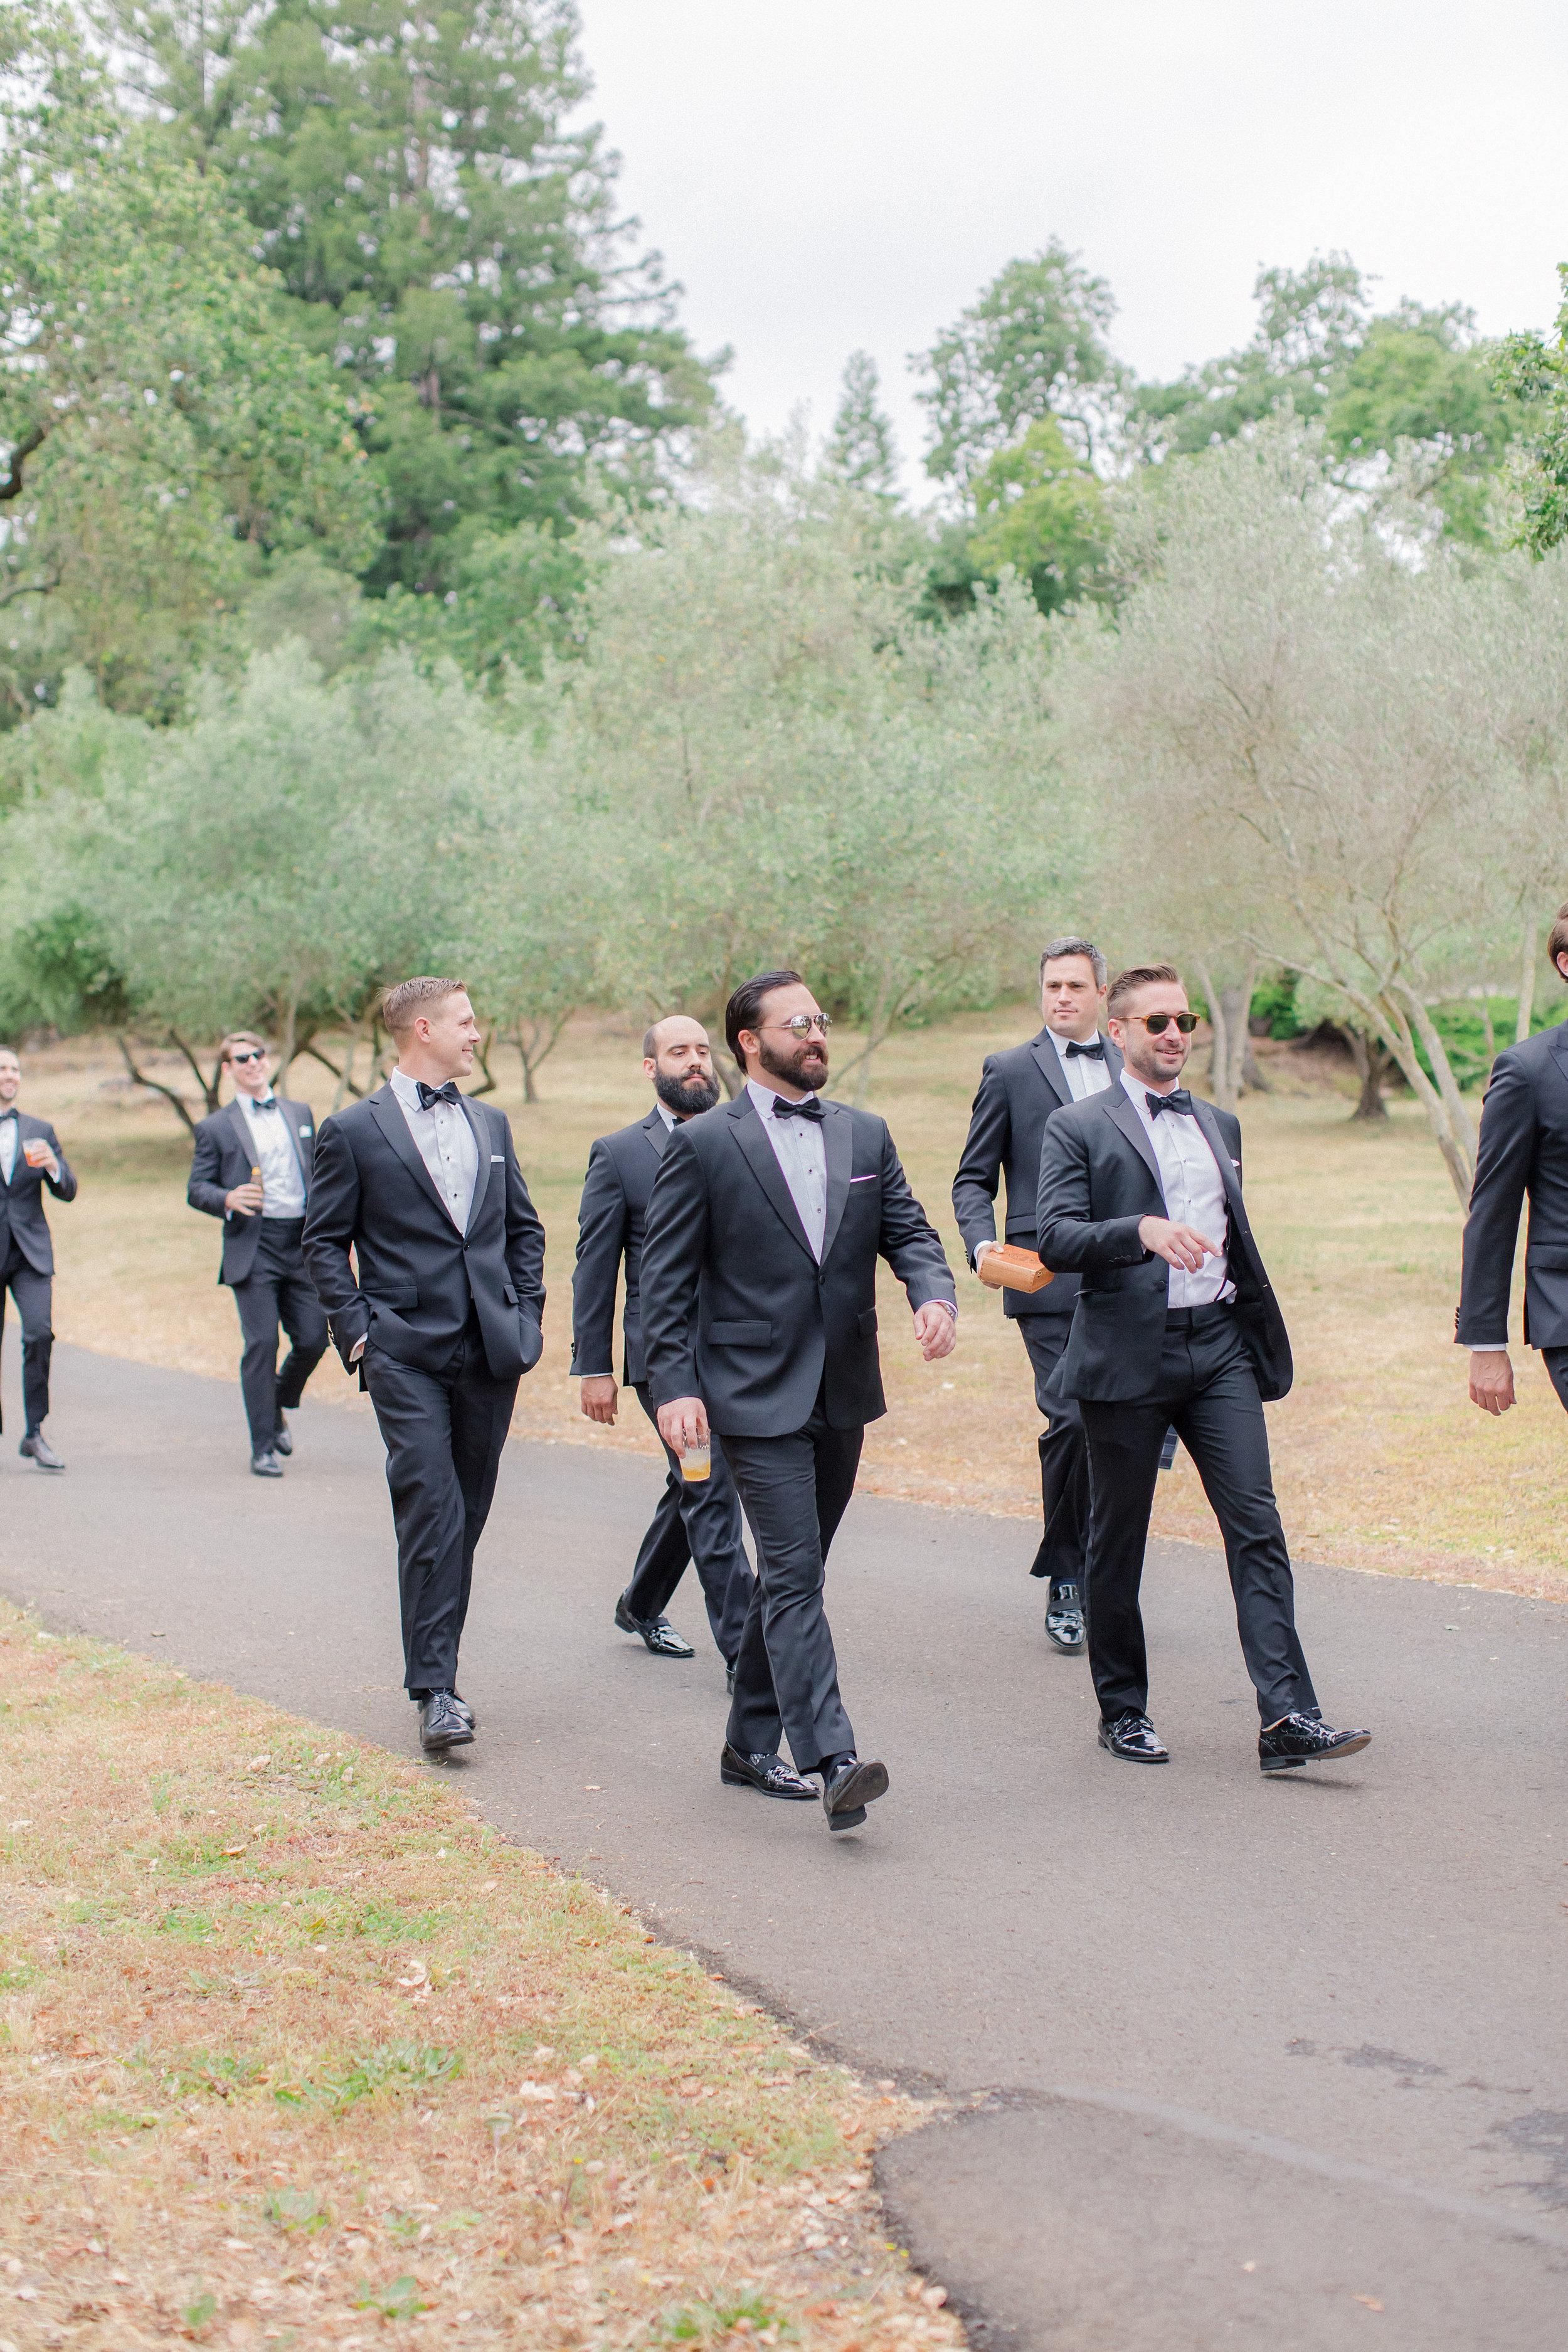 california-wedding-day-lrelyea-events-lori-paladino-photography3.jpg